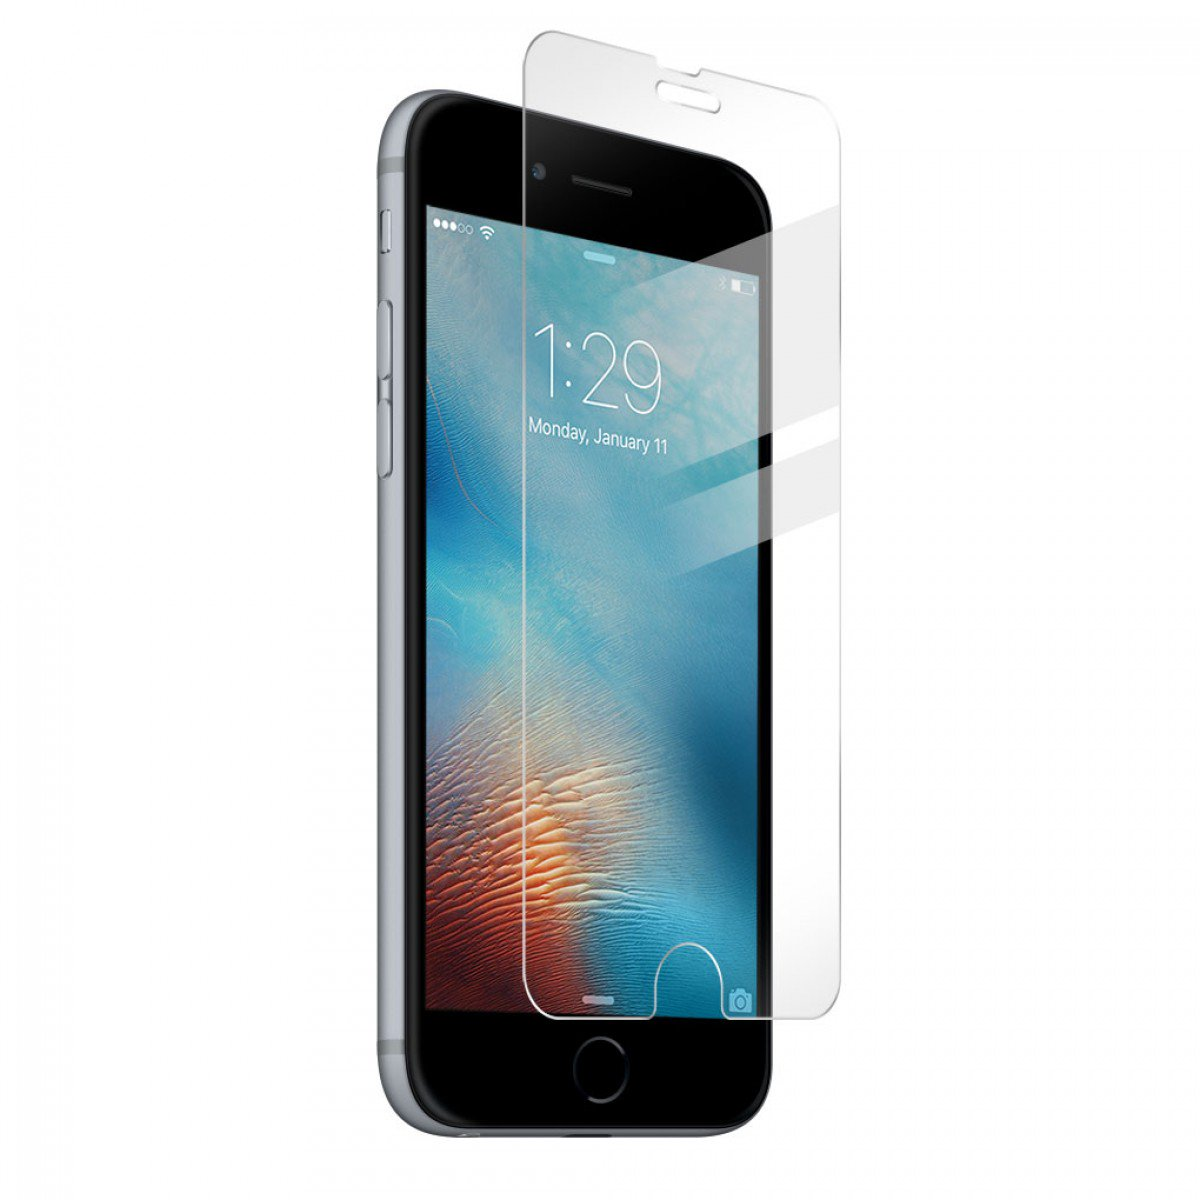 bodyguardz-pure-tempered-glass-screen-protector-iphone-6s-plus-hero_1_1.jpg